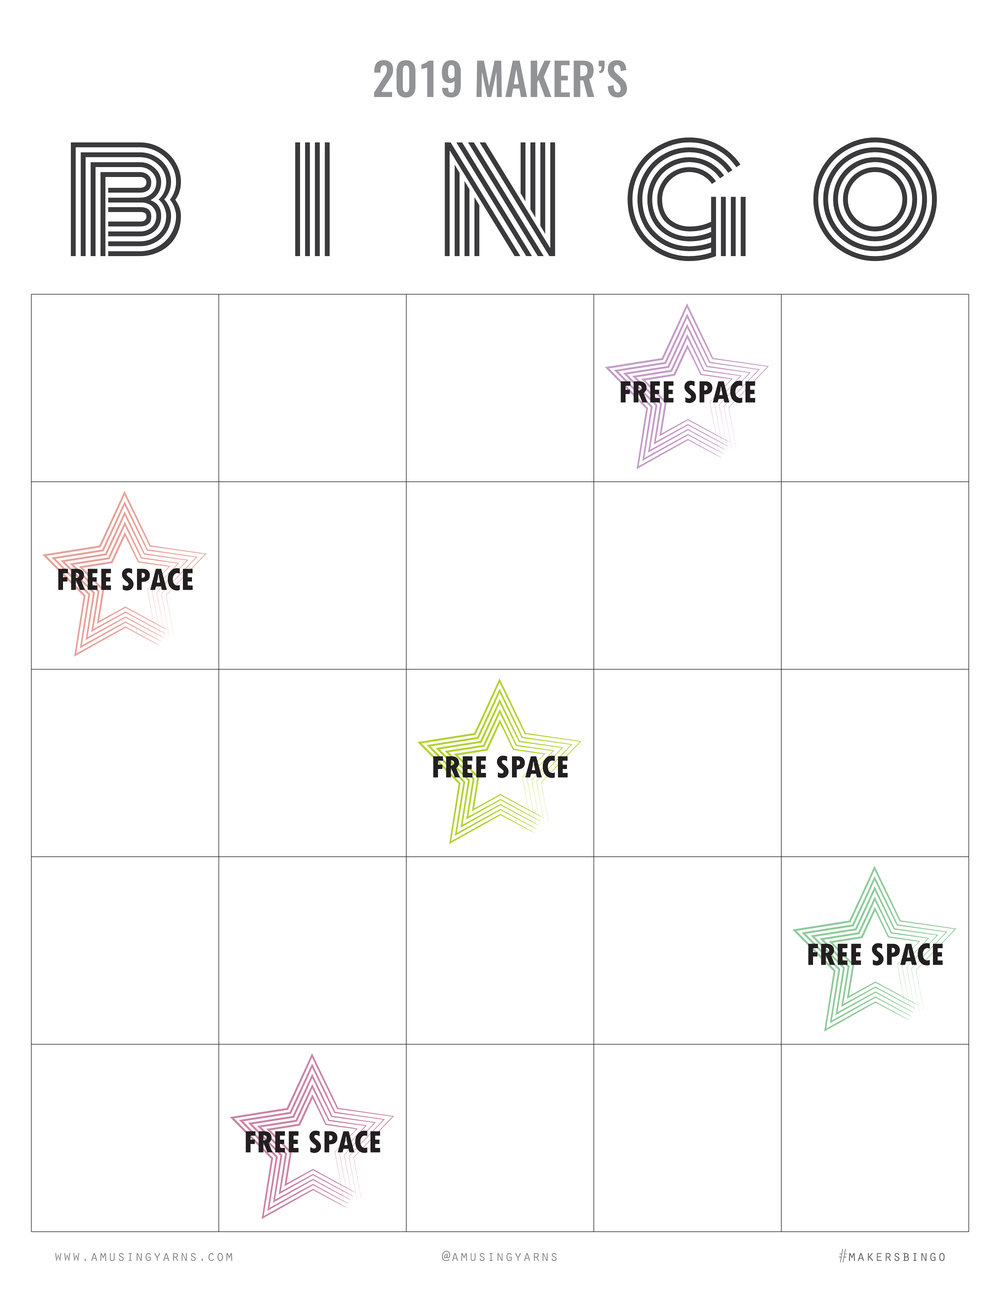 2019 Maker's Bingo Card